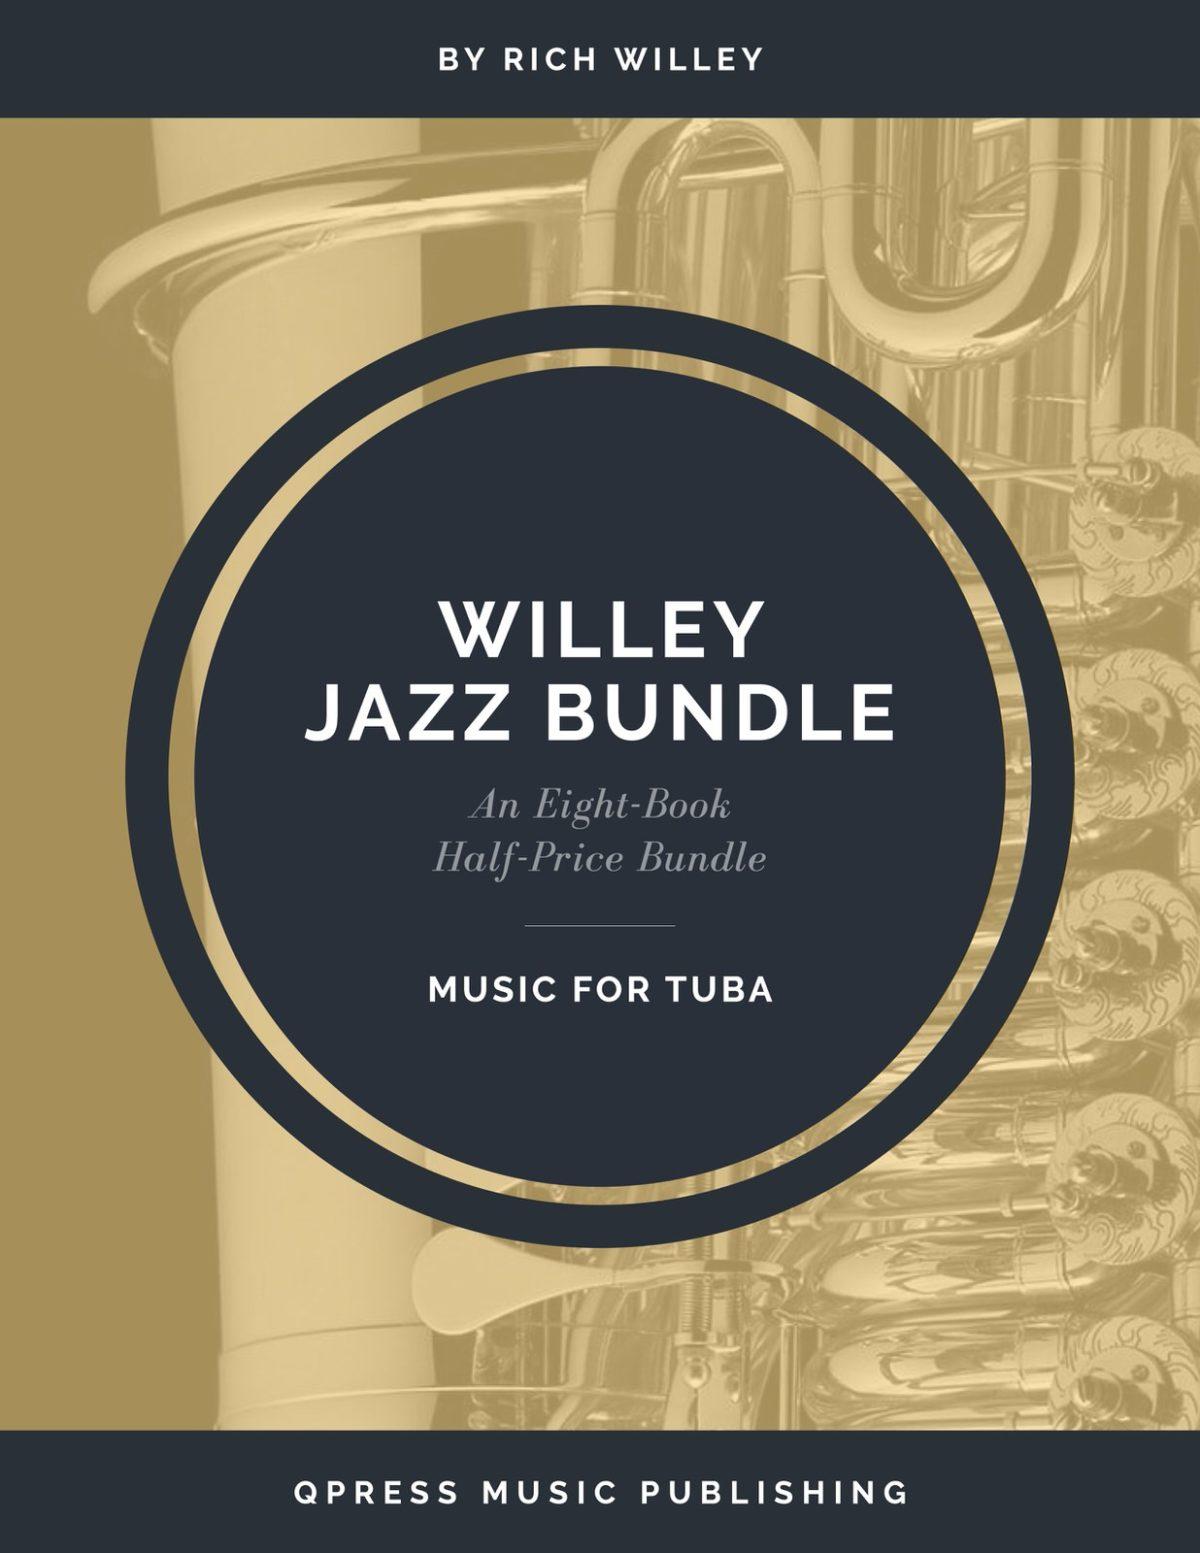 Willey Jazz Bundle for Tuba